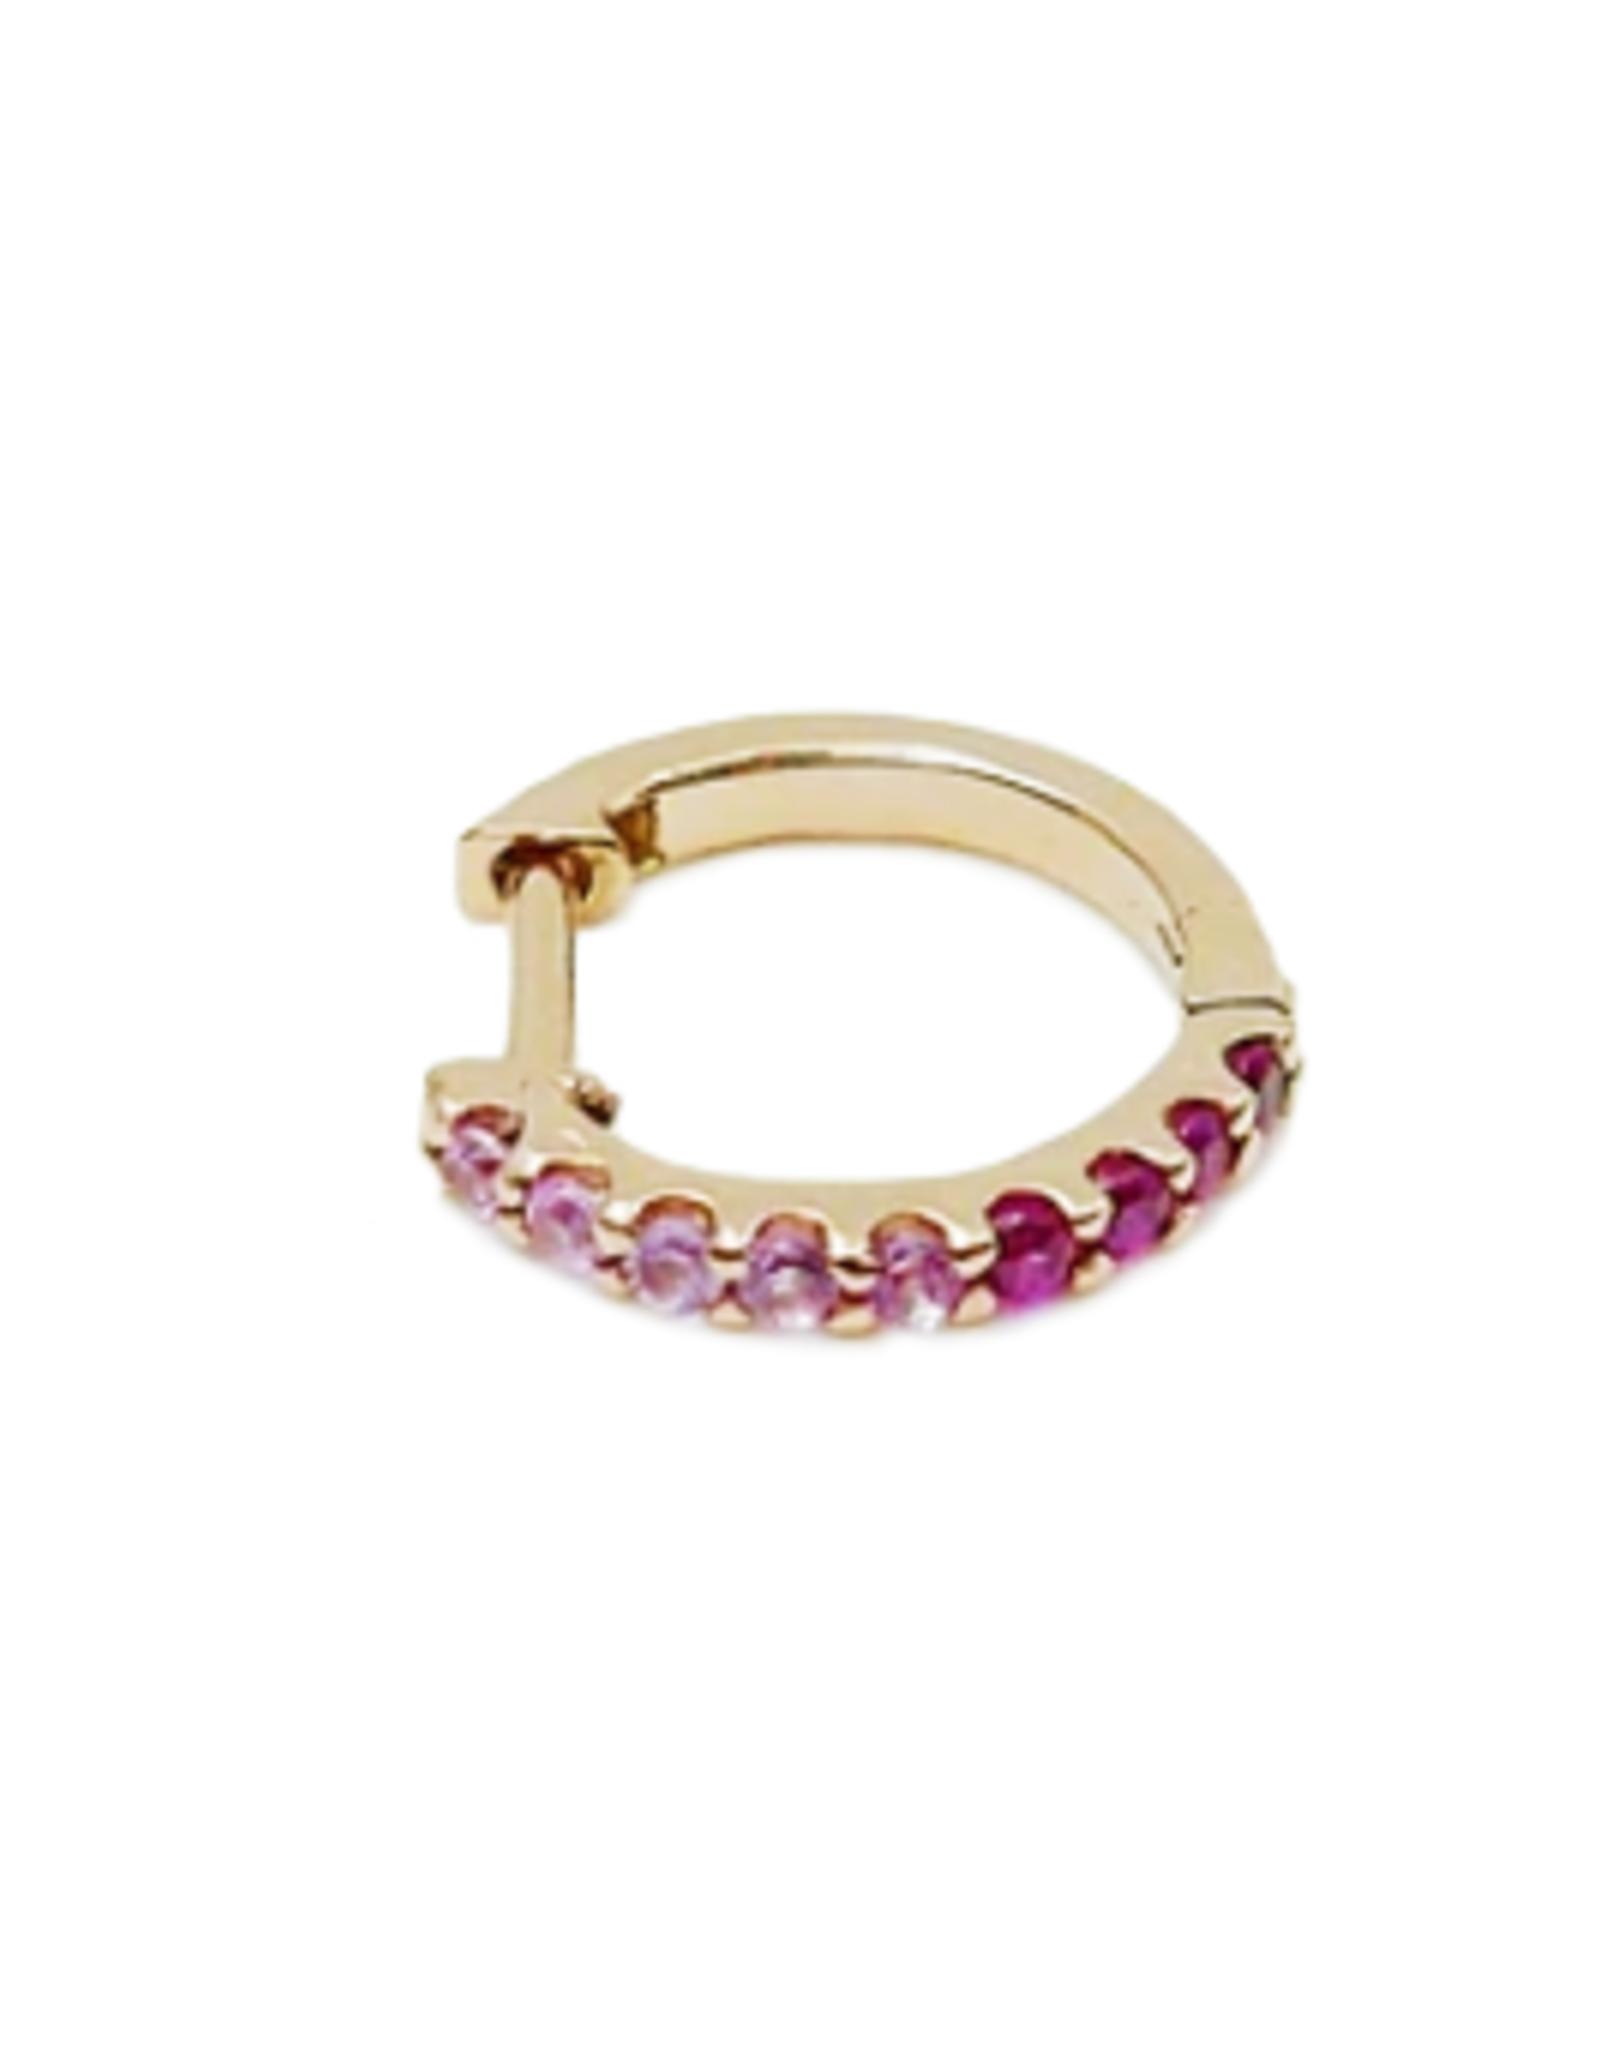 Mason Grace Jewelry Mini Bicolor Hoop - Pink Sapphire + Ruby